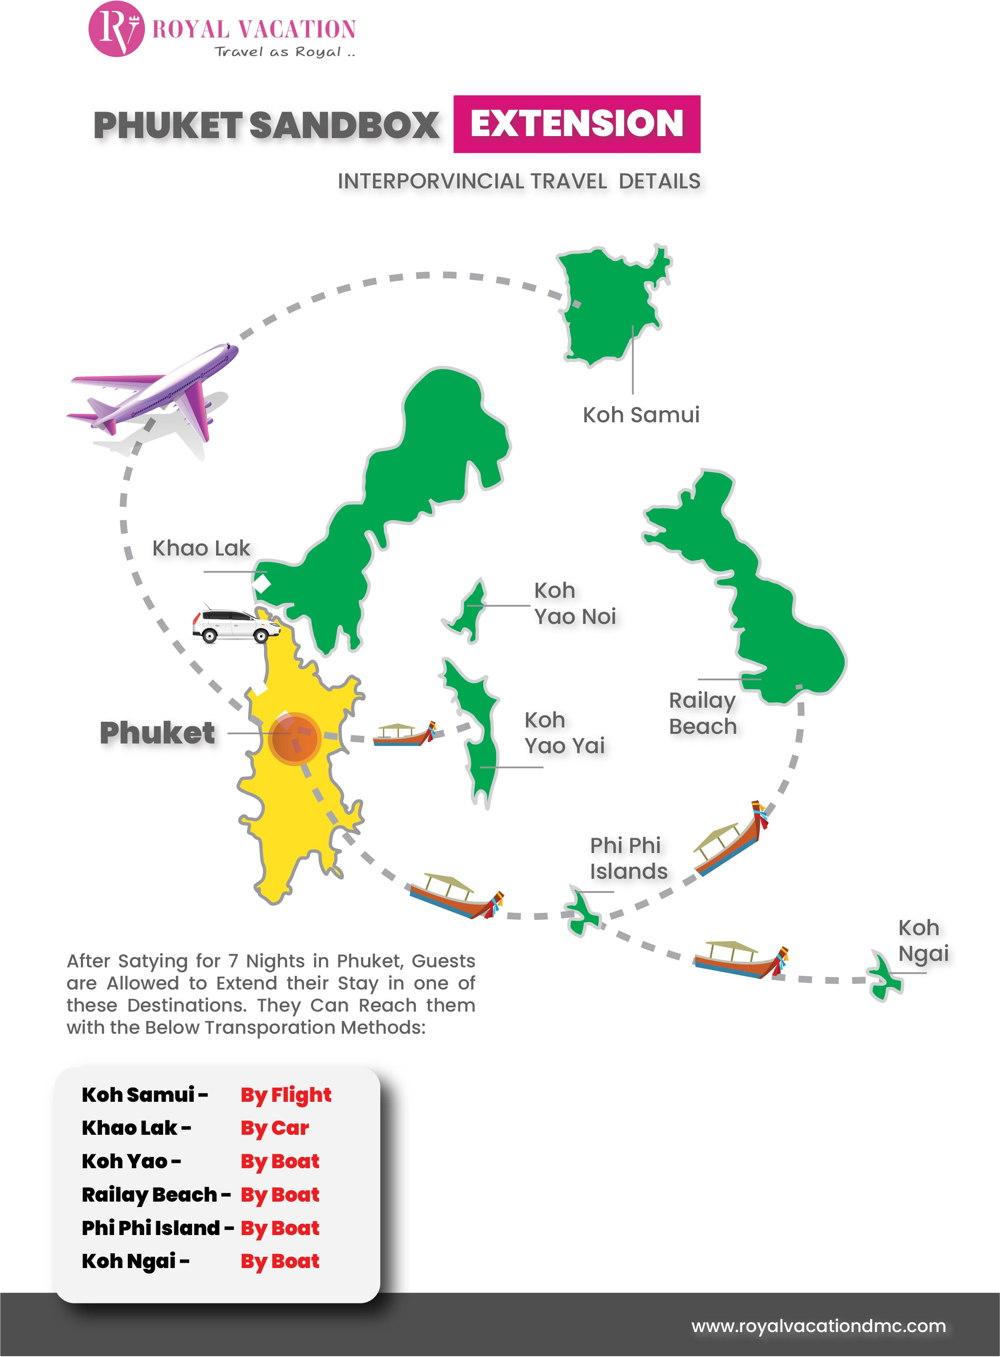 Phuket Sandbox Extension interprovincial Travel